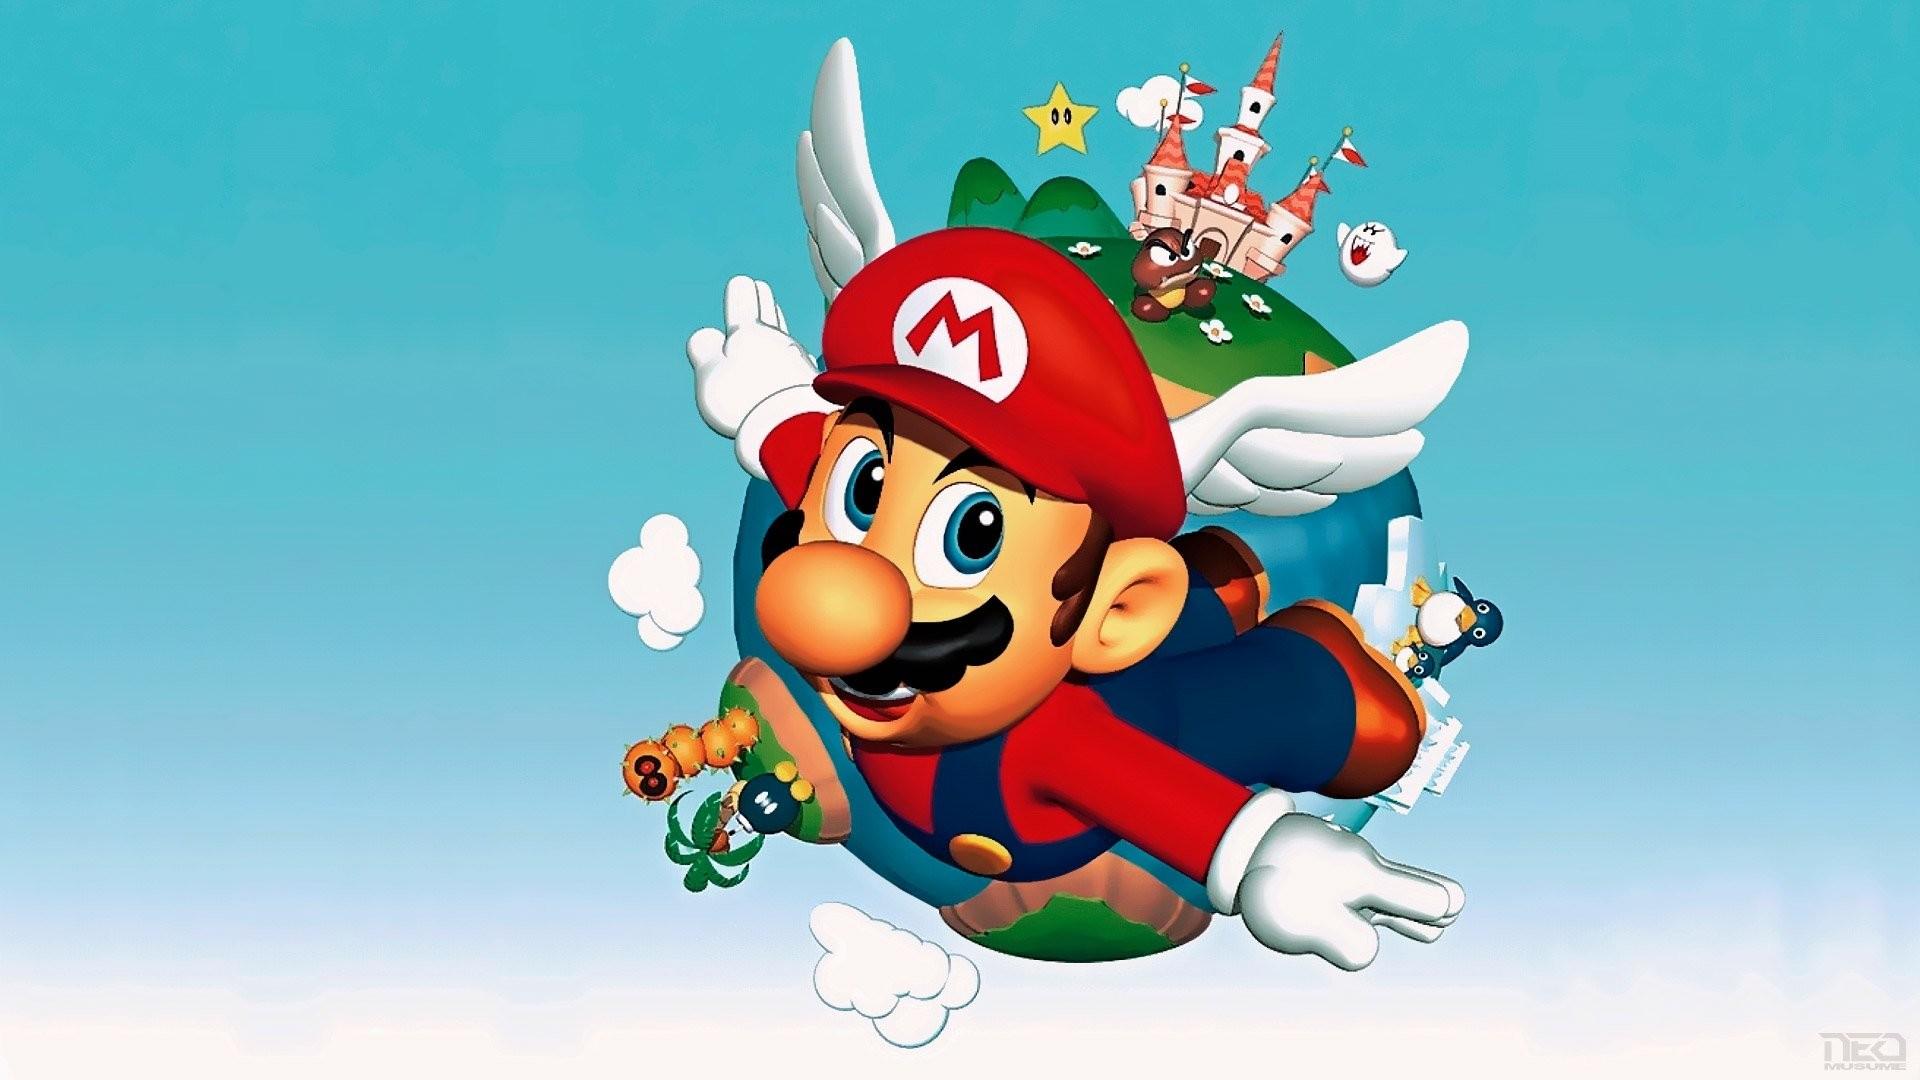 Super Mario Phone Wallpaper (77+ images)